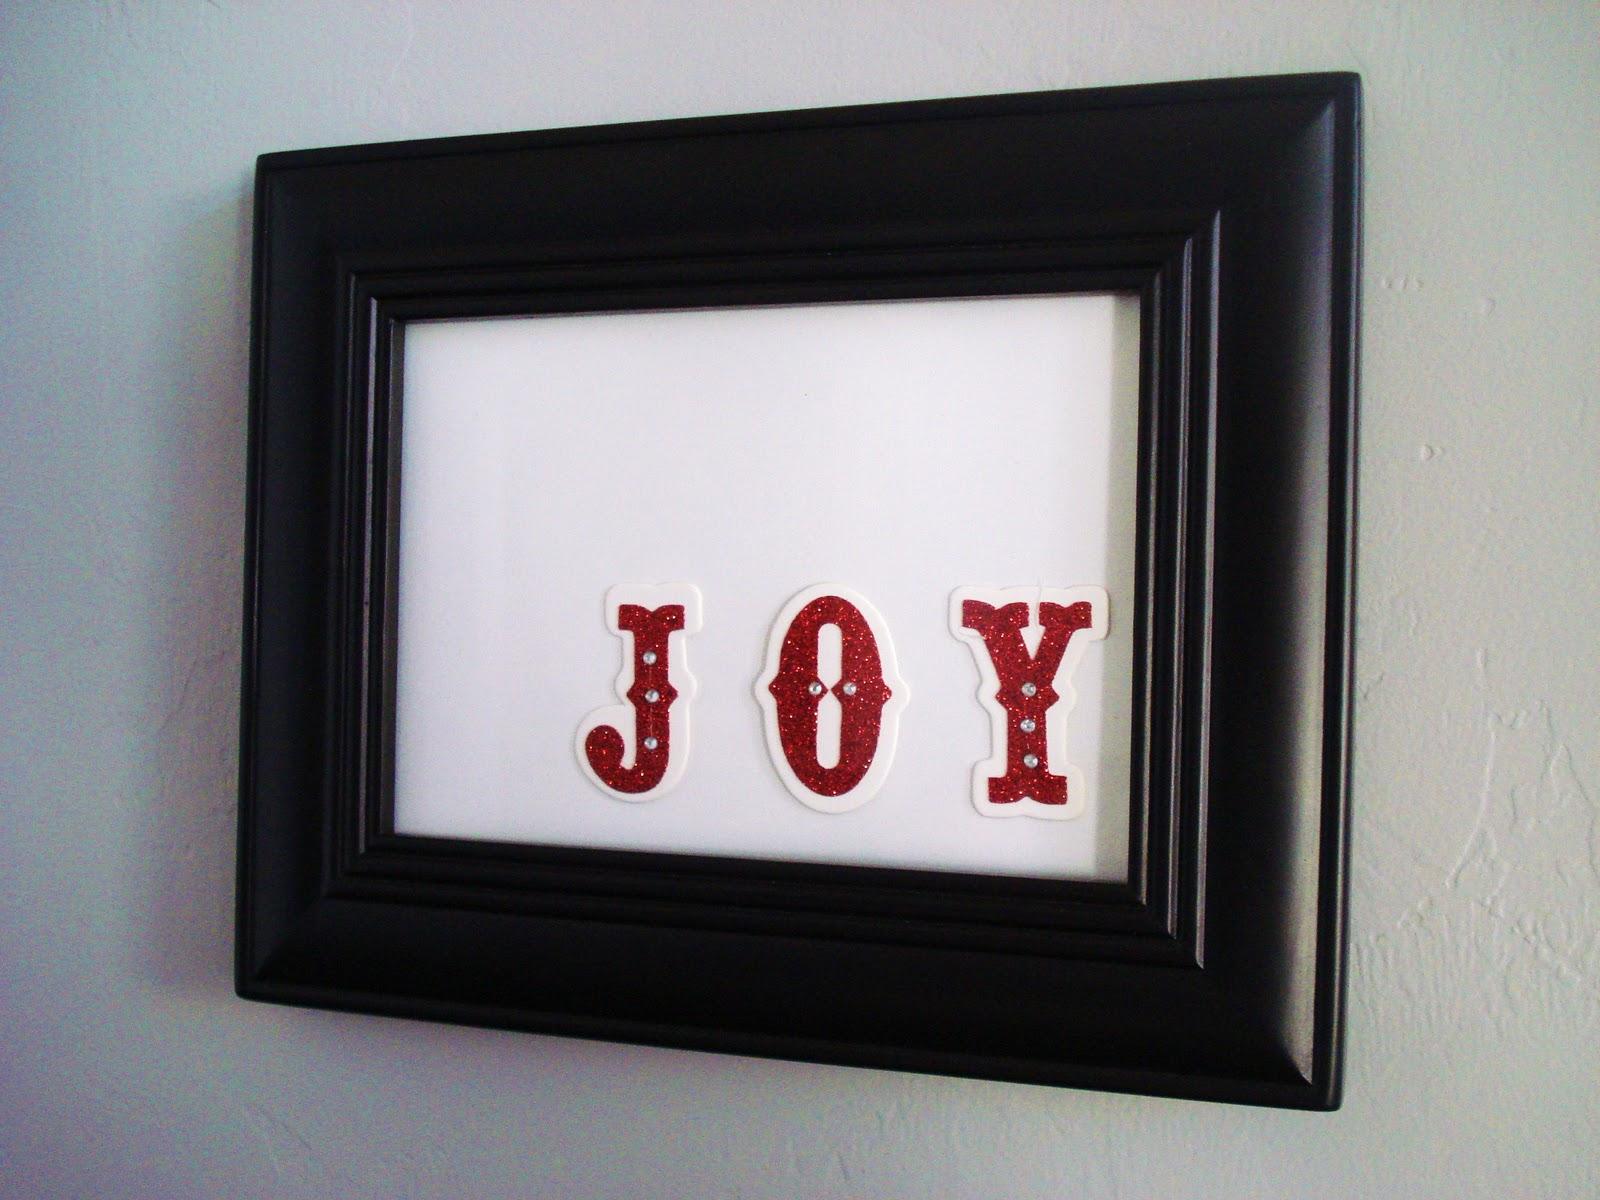 Simple Christmas Wall Display - Inspired RD